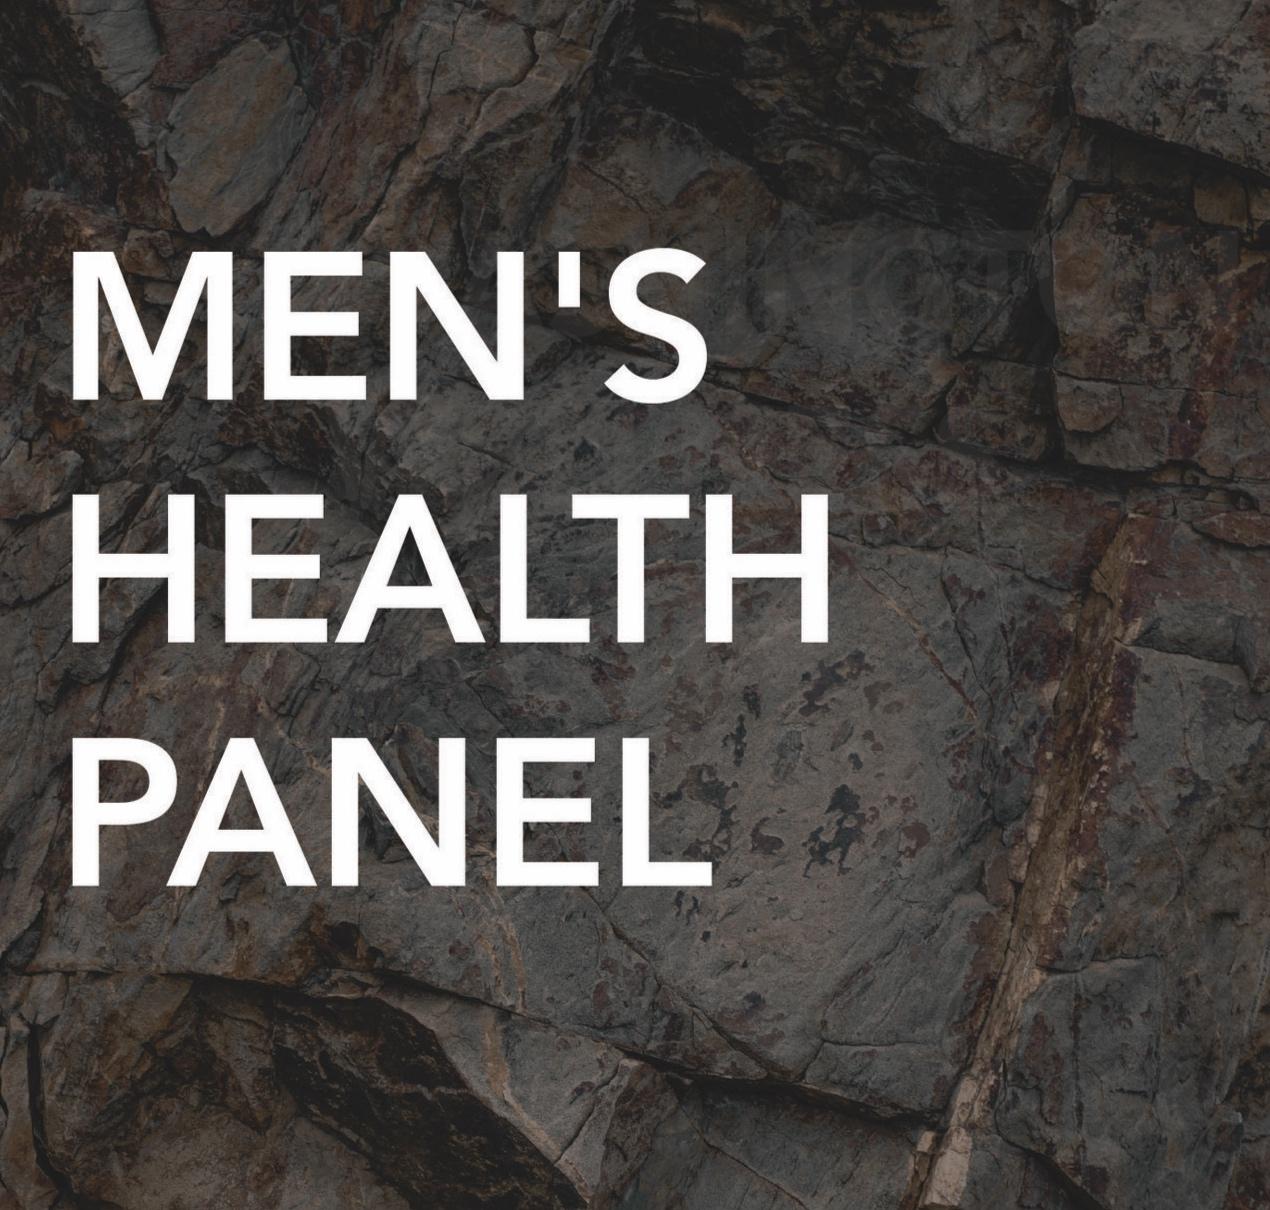 MENS%2BHEALTH%2BLAB%2BTESTING%2BCENTRAL%2BILLINOIS.jpg